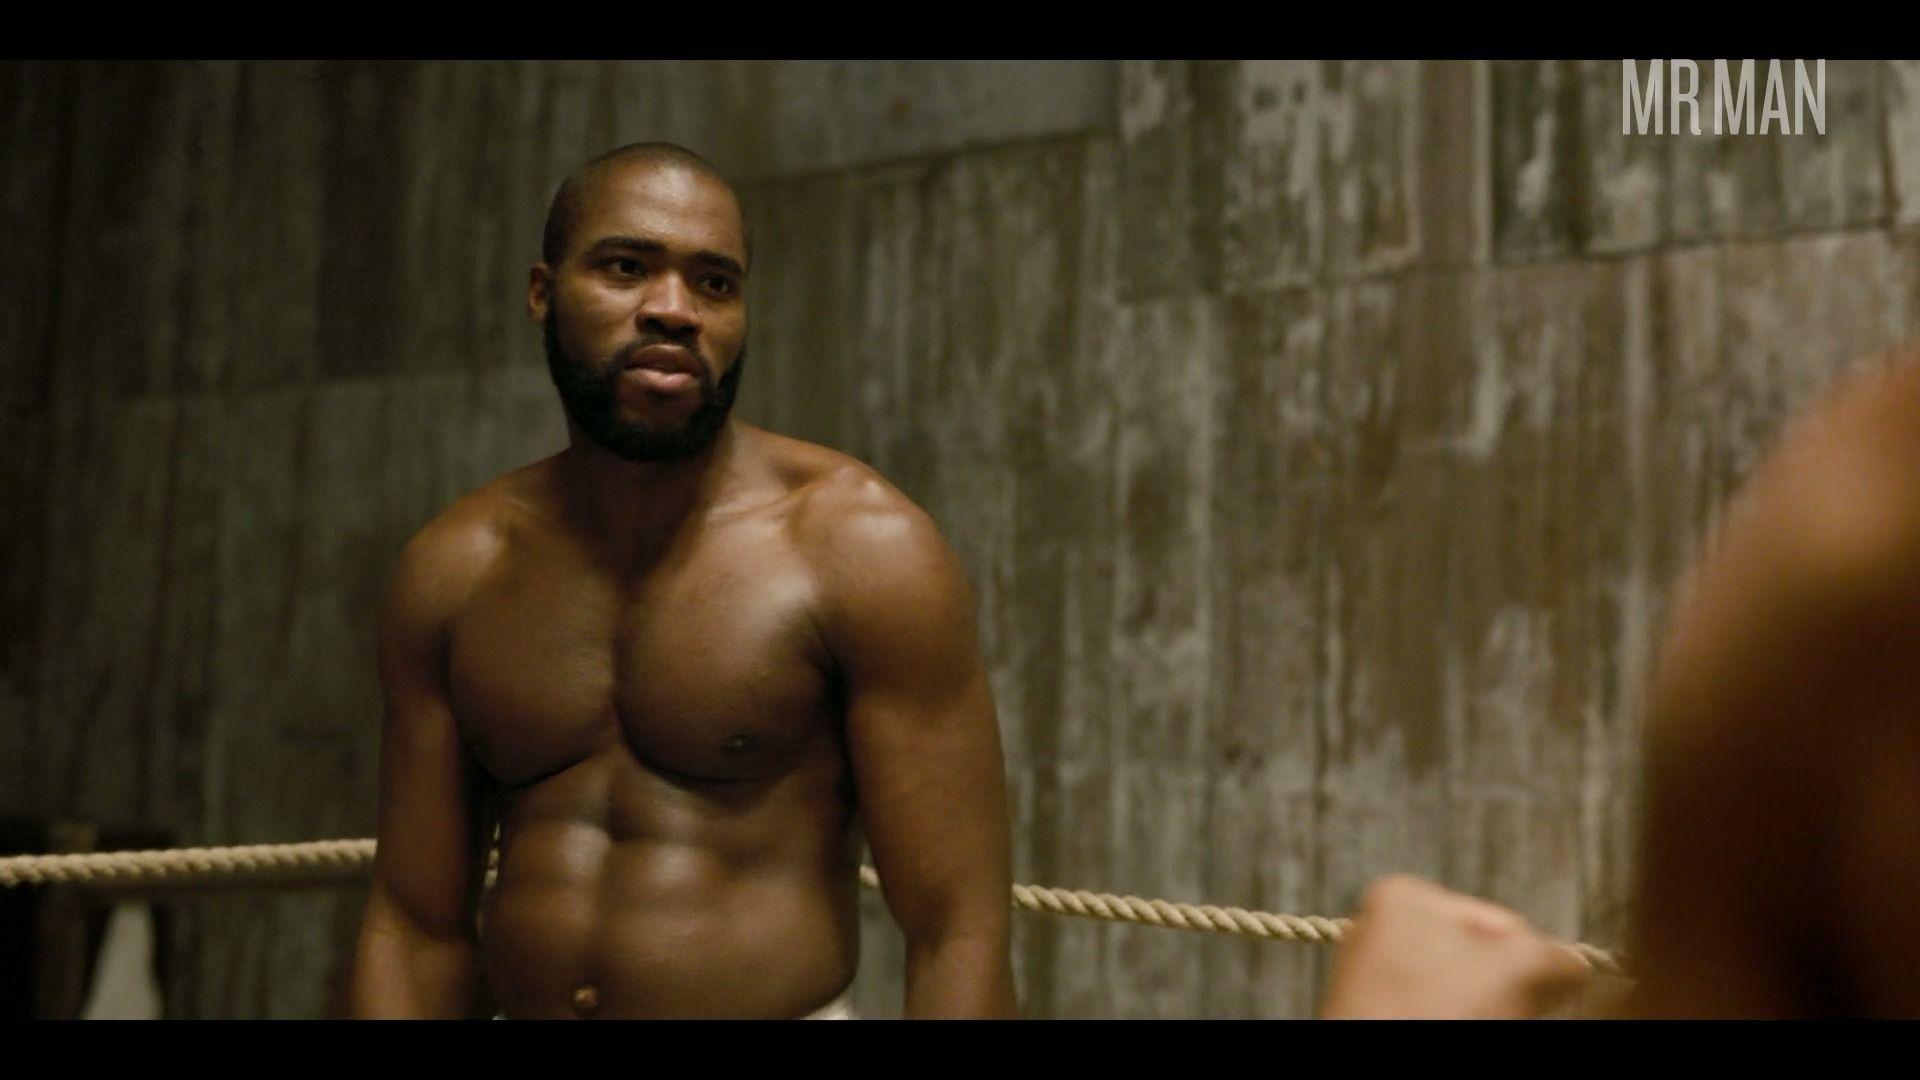 Watch Nude Matt Bomer Scenes at Mr. Man